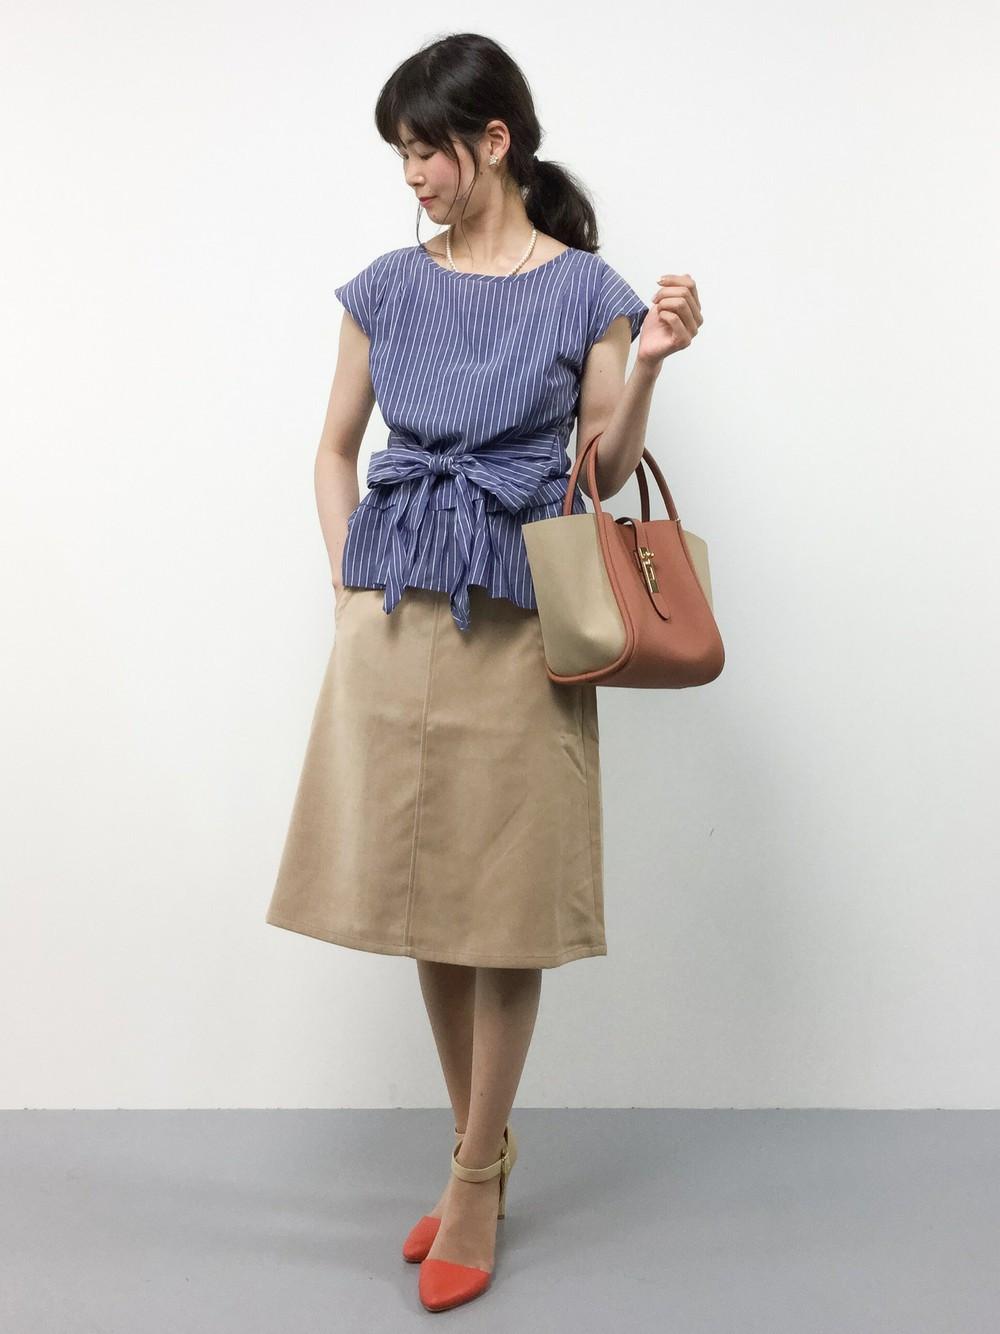 出典:kiyoko